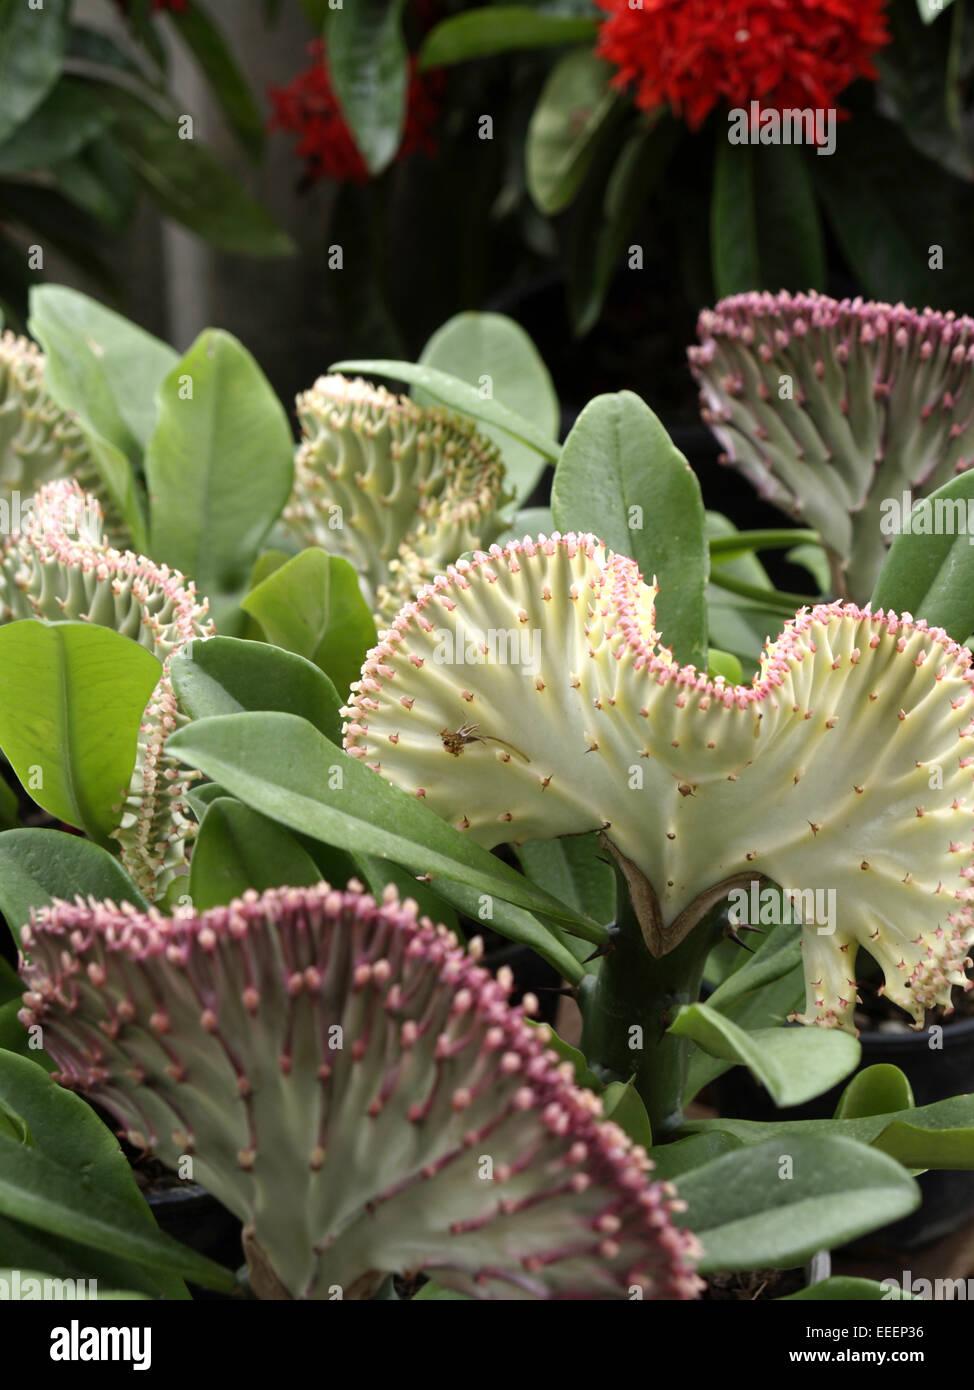 Thailand, Asien, Suedostasien, Reiseziel, Pflanze, Blatt, Blaetter Stockbild